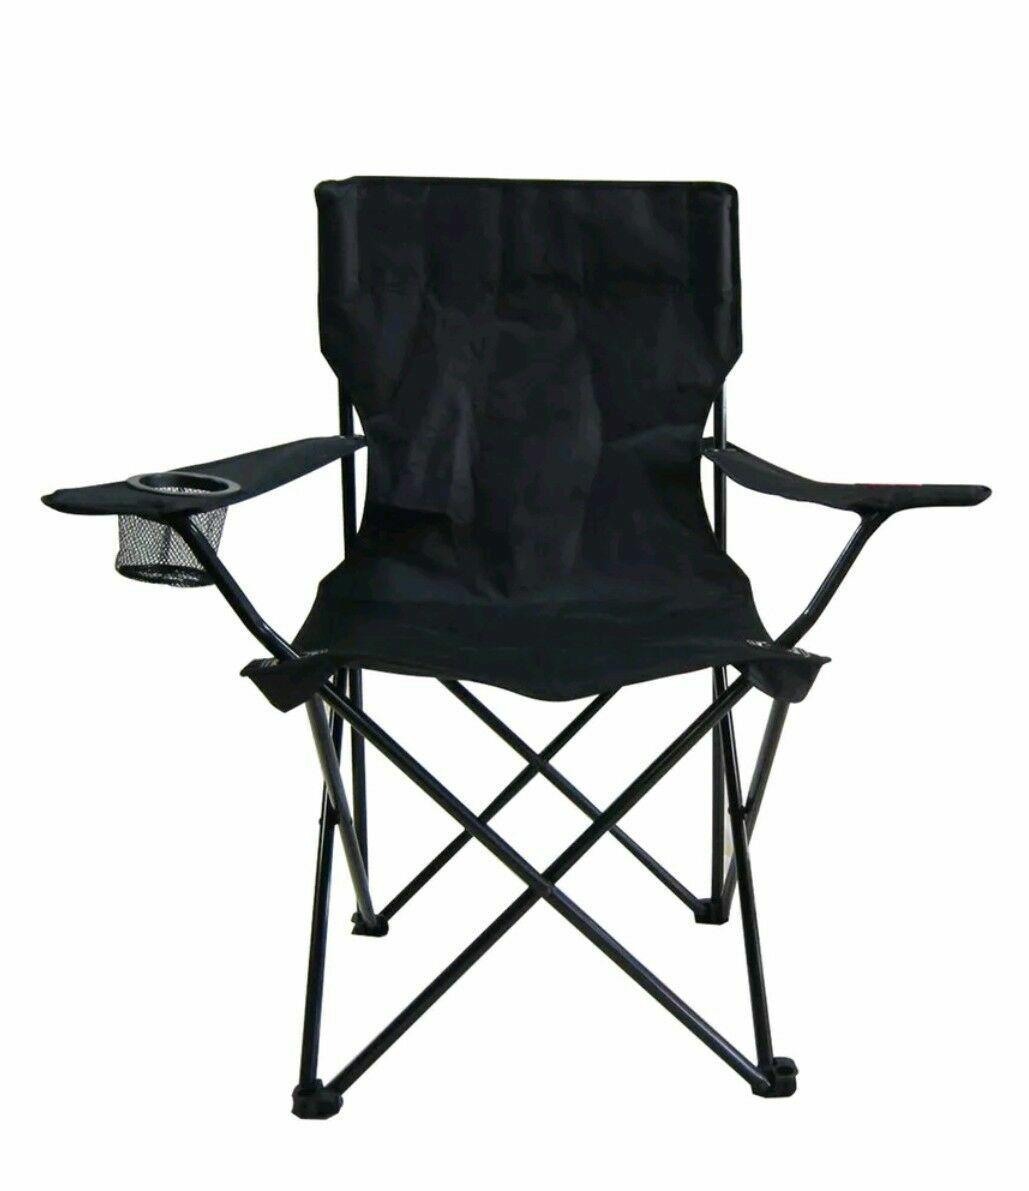 Admirable Garden Treasures Hpc86177 2D Camping Chair Black Cjindustries Chair Design For Home Cjindustriesco